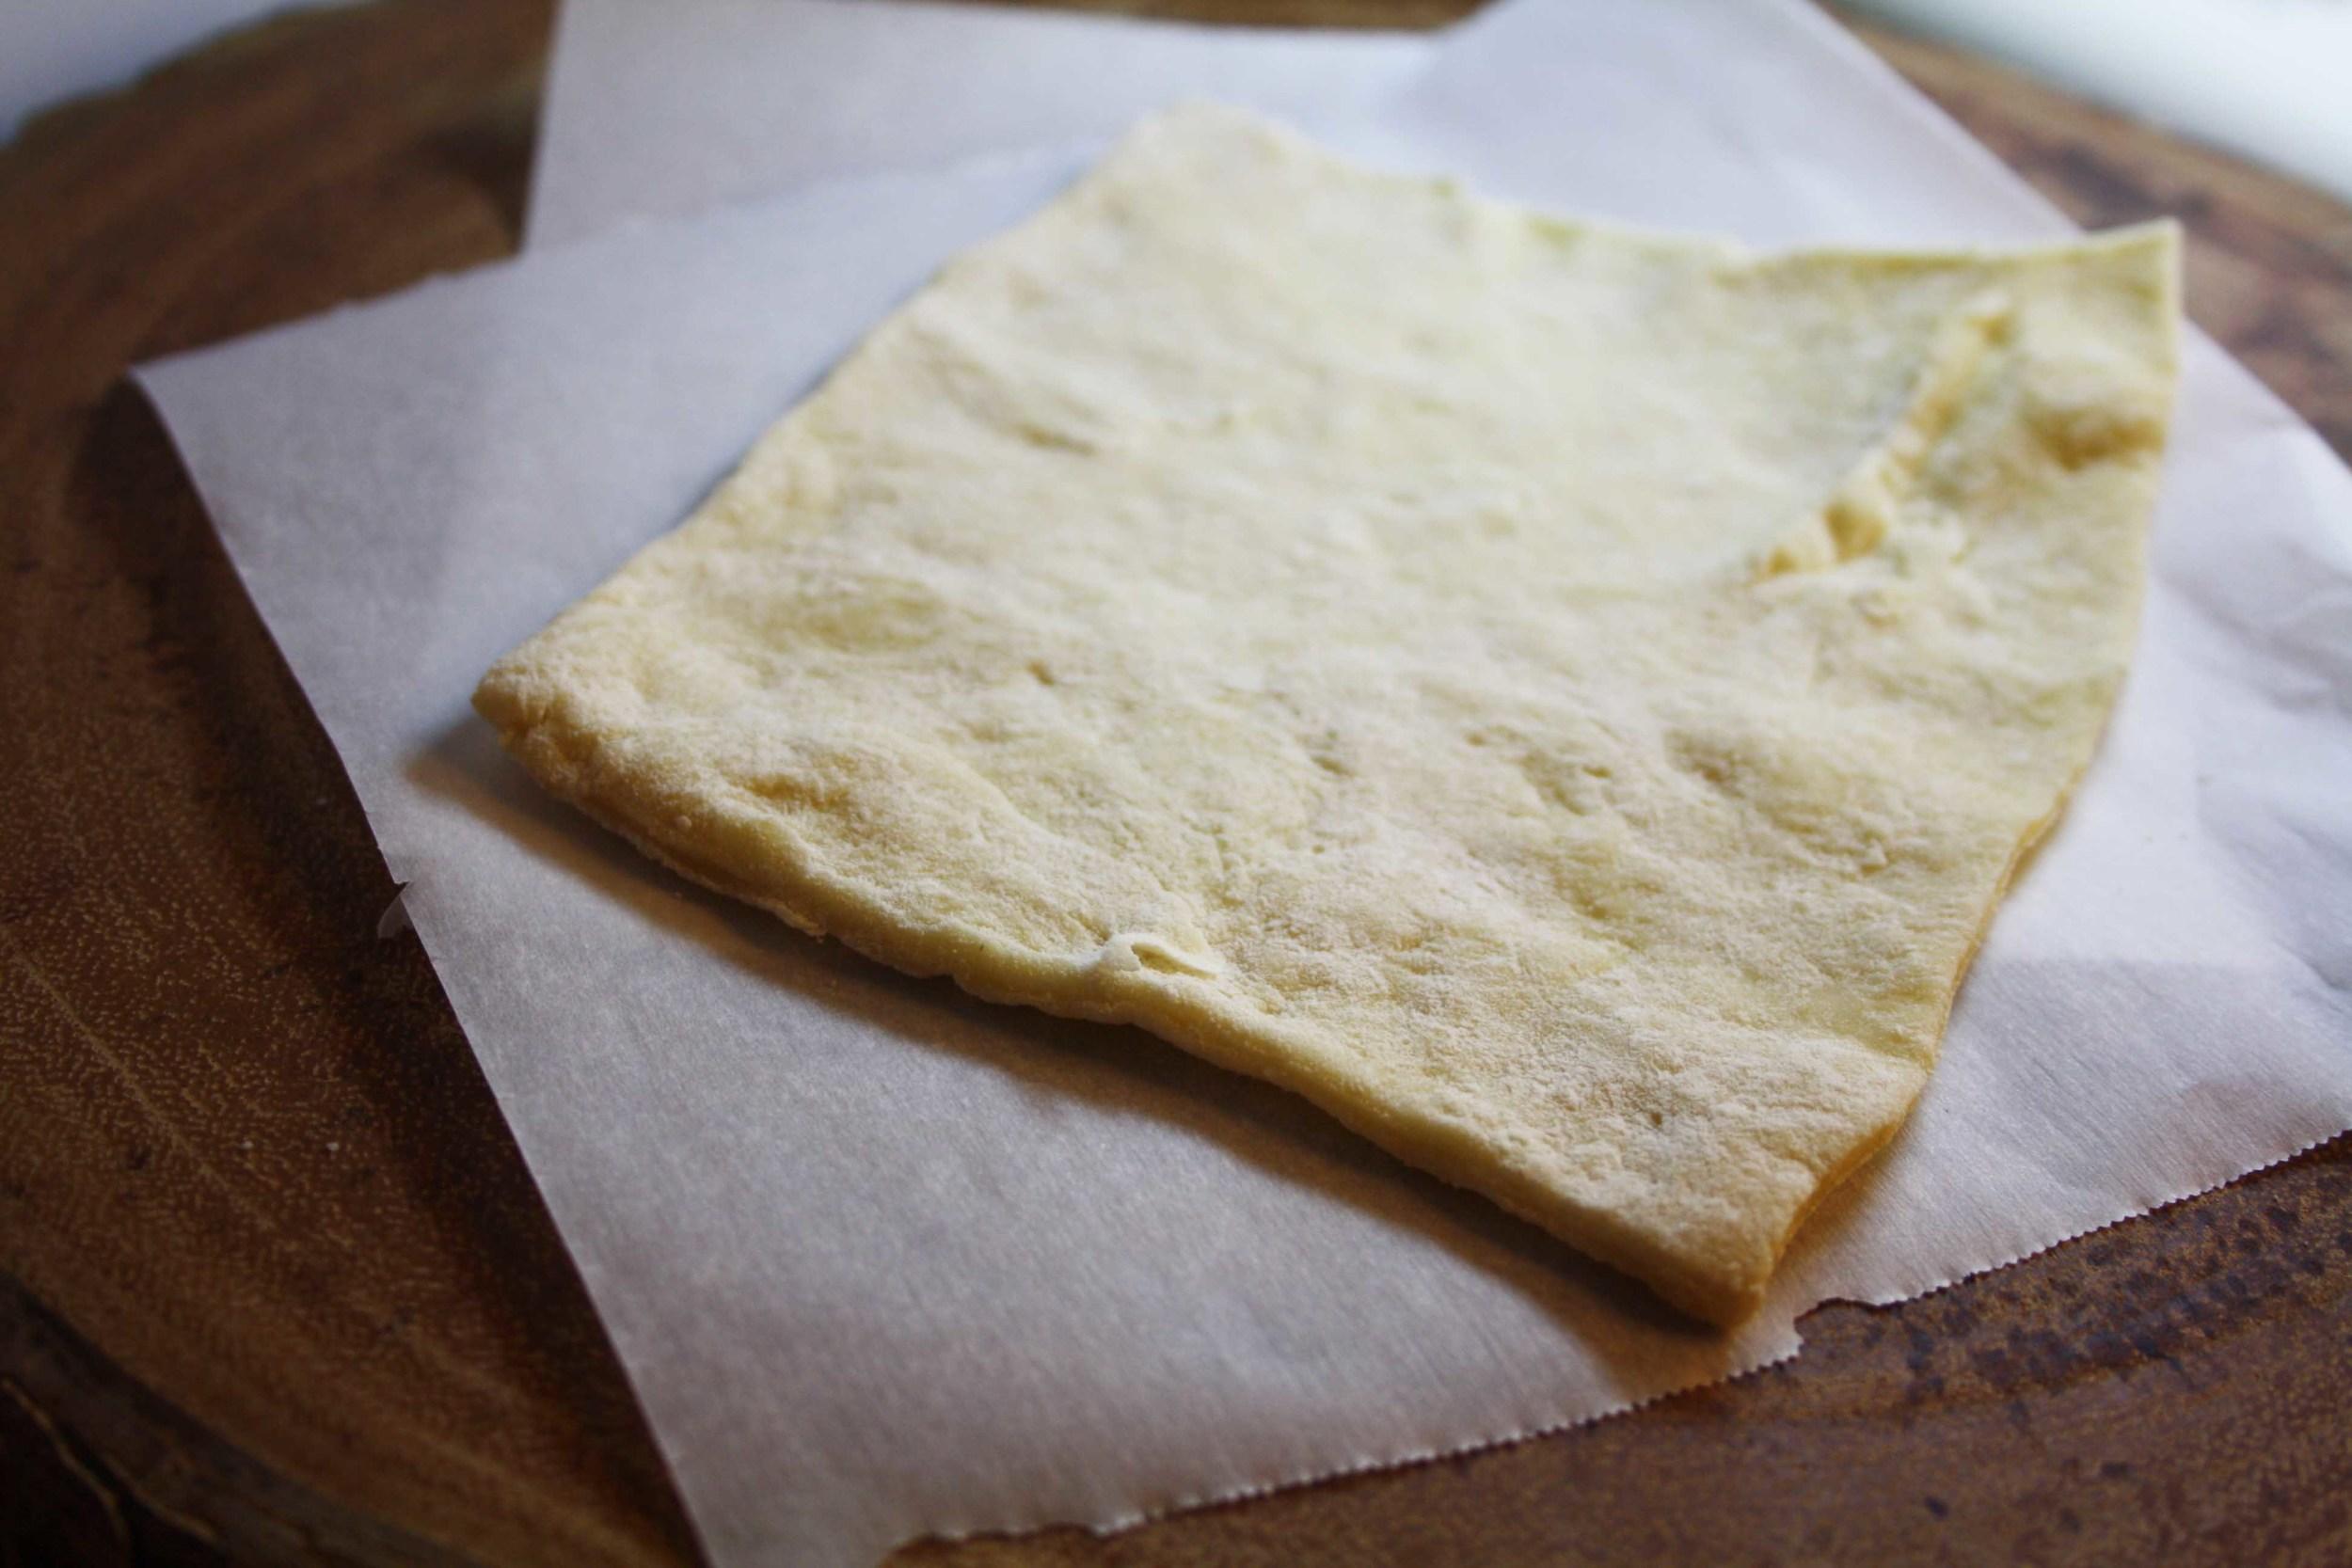 Basic empanada dough